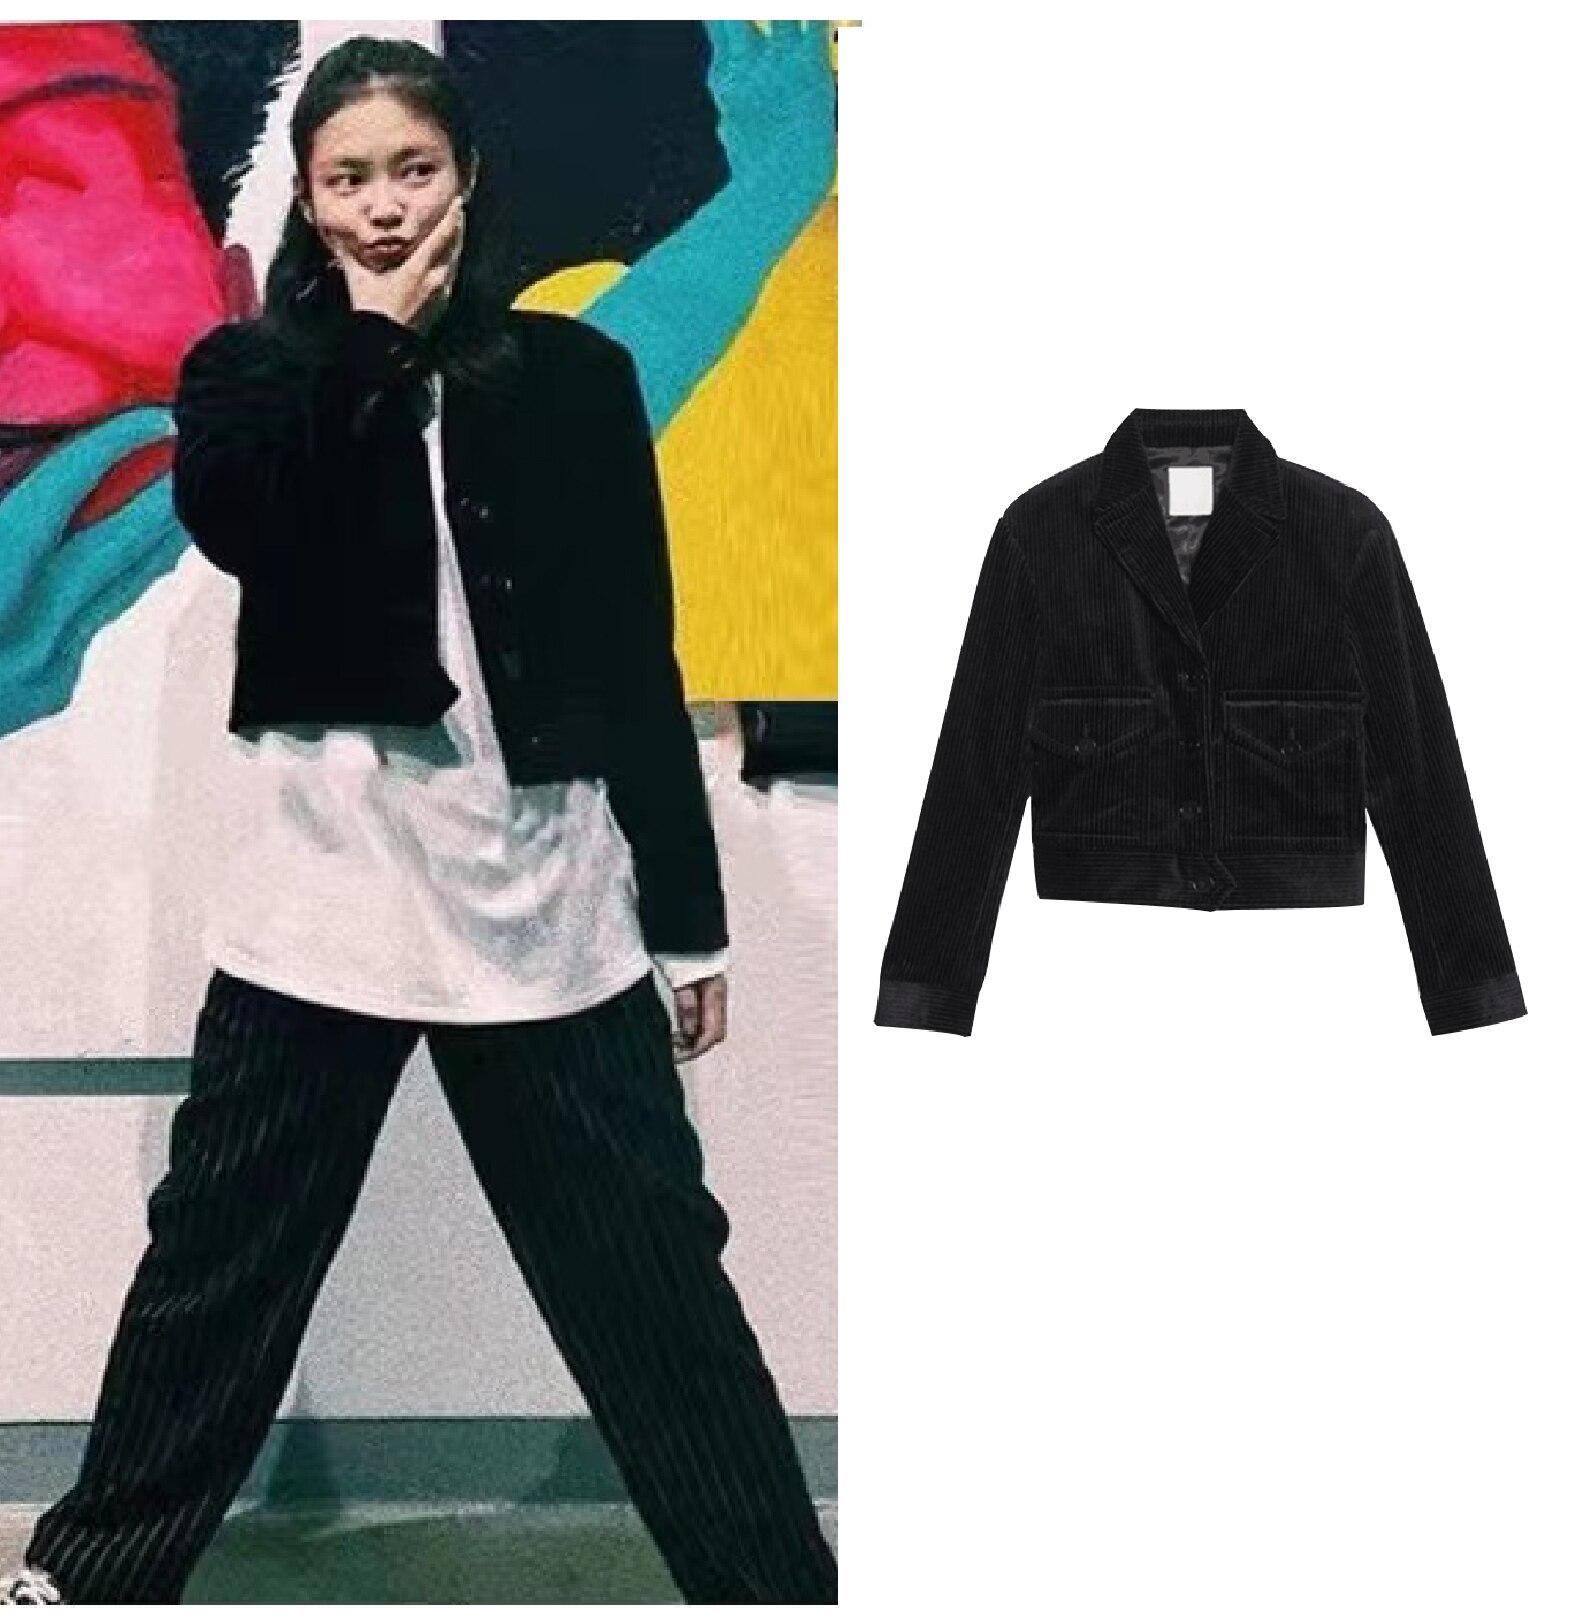 معطف قصير كبير الحجم للنساء من Kpop IU Seo Yea Ji جاكيت كودري نسائي كوري غير رسمي للنساء